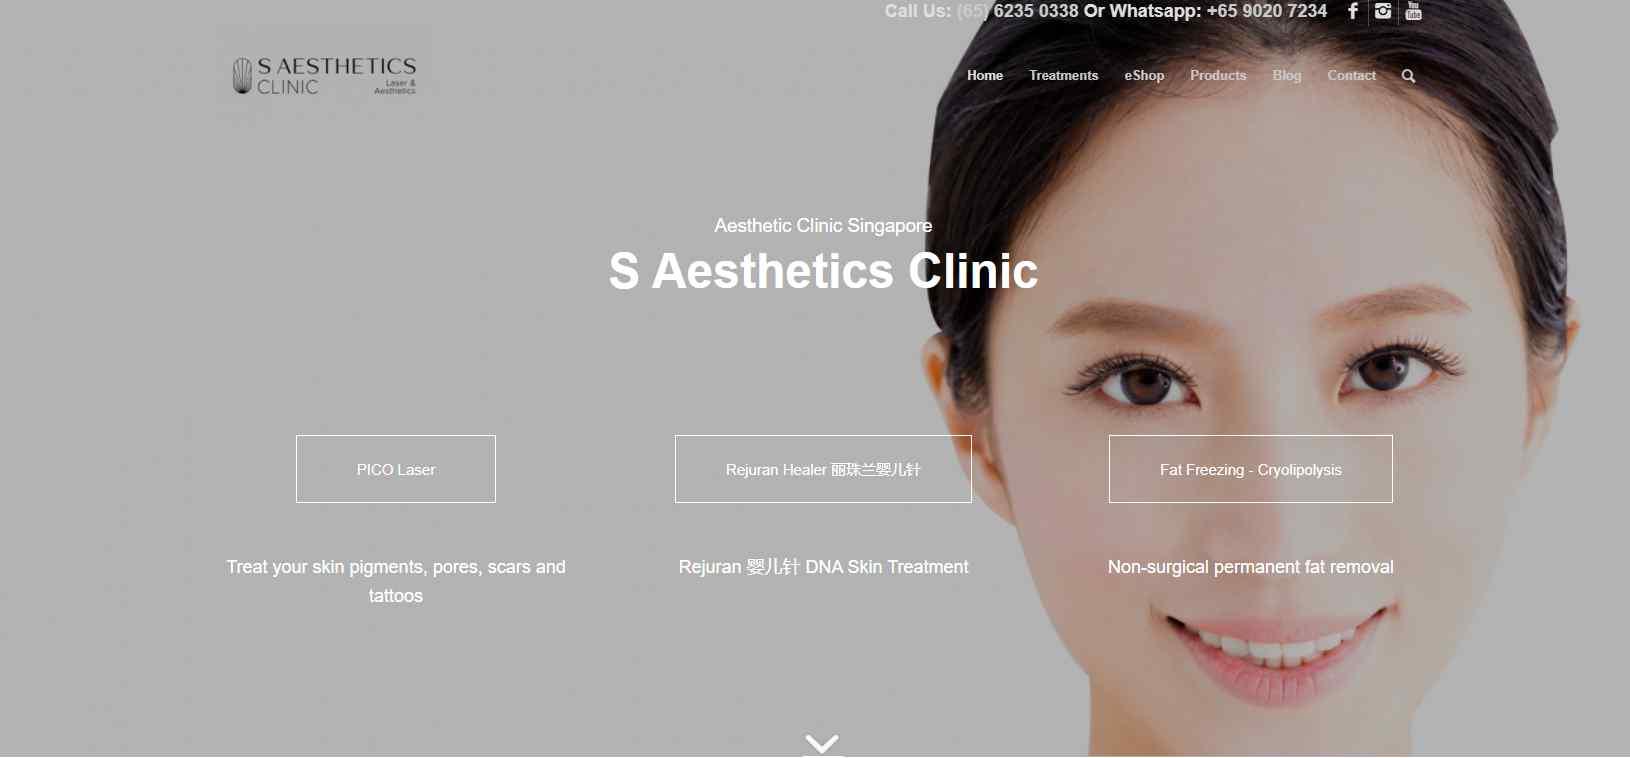 S Aesthetics Top Hair Loss Treatment Clinics in Singapore